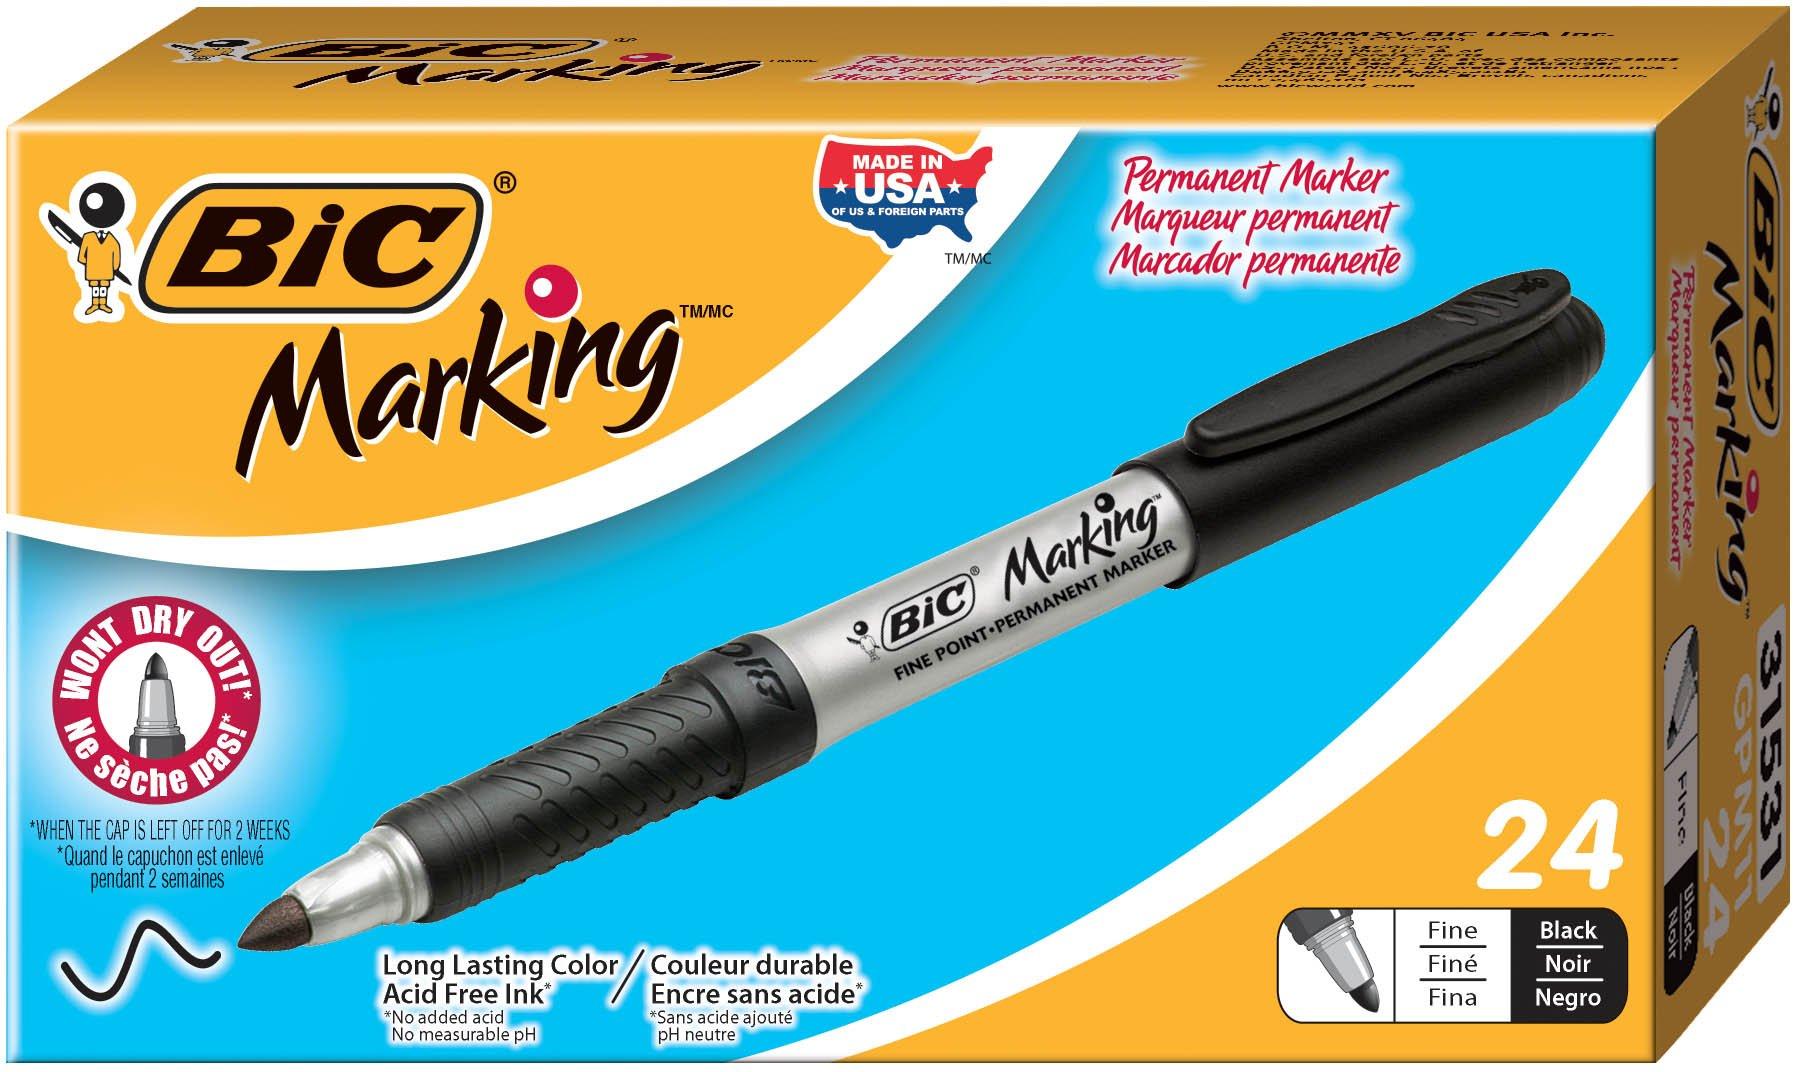 BIC Marking Permanent Marker, Fine Point, Black, 24-Count